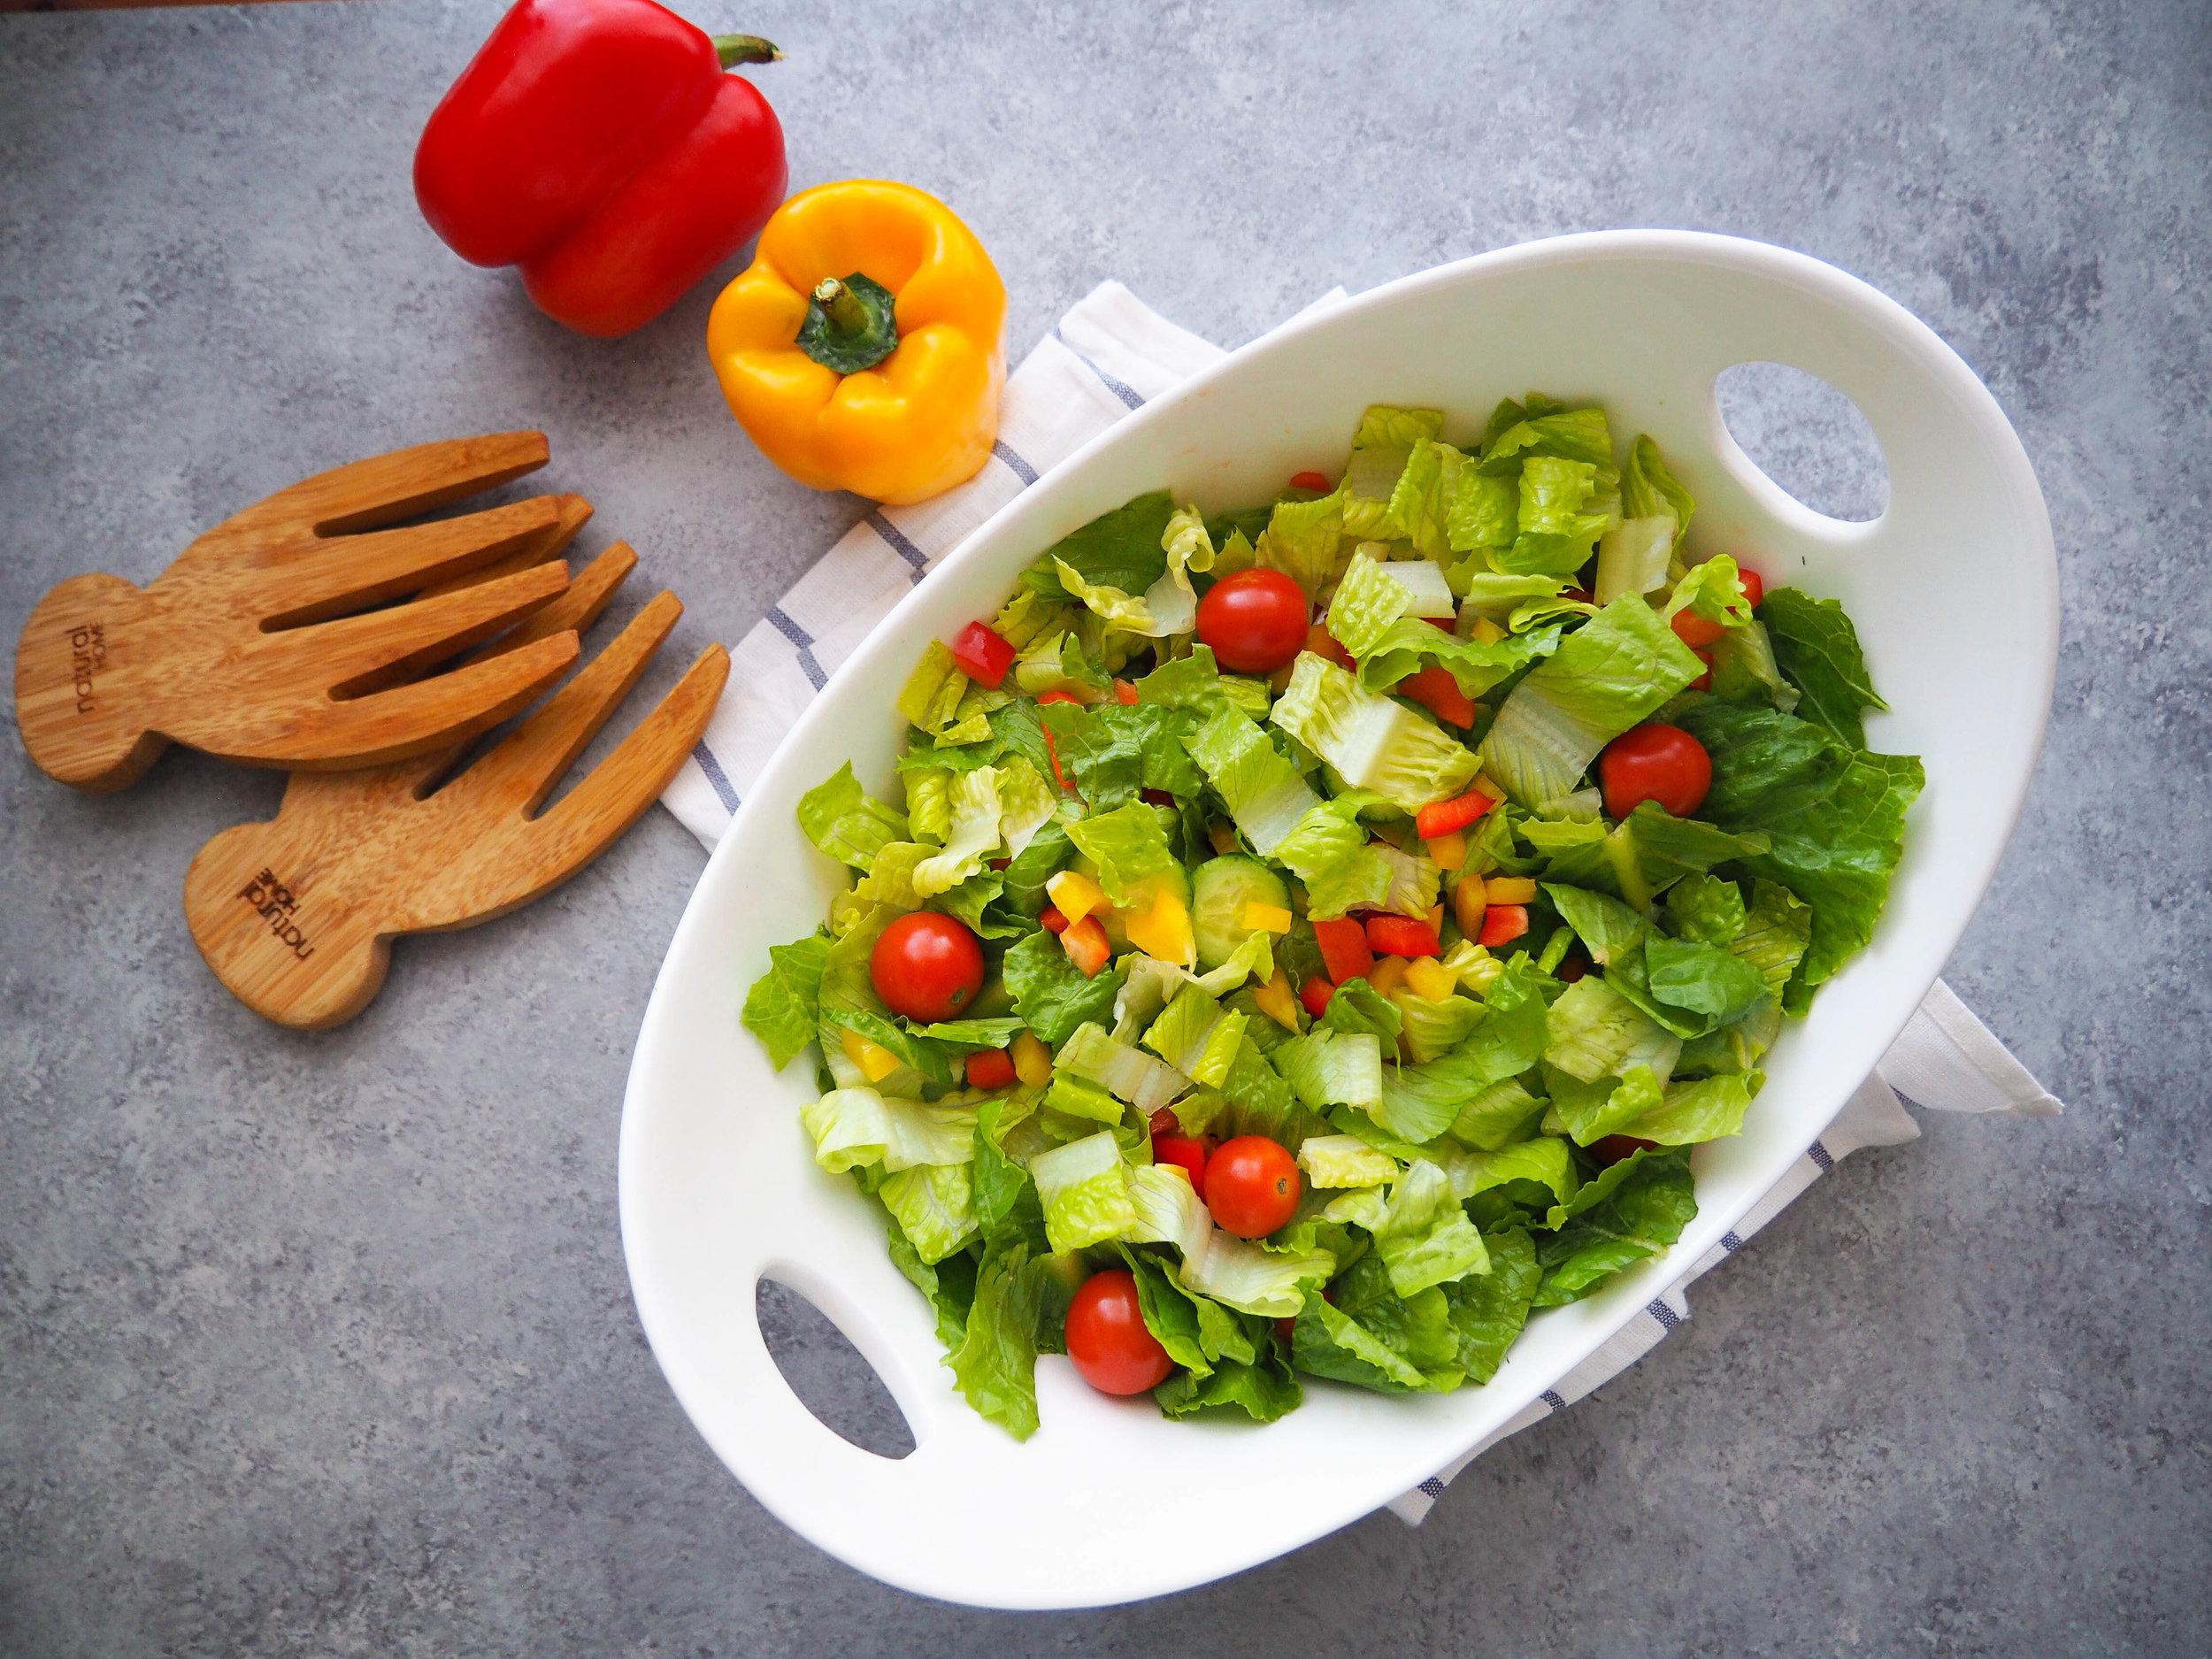 Crunchy Vegetable Salad Mix